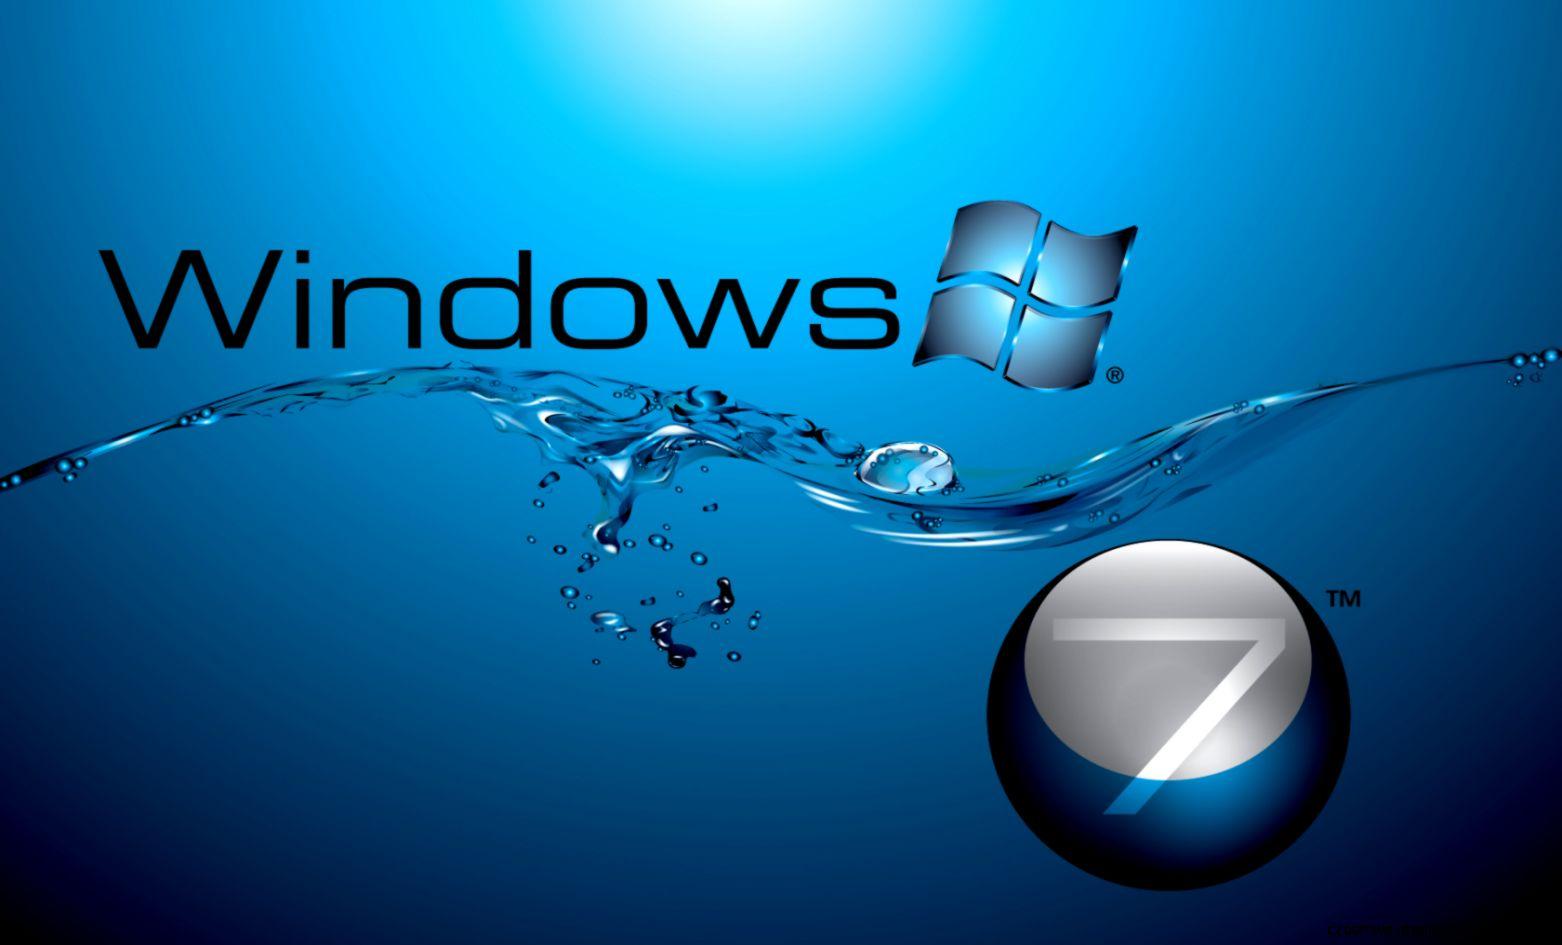 Windows 7 in Water Flow Wallpapers  HD Wallpapers